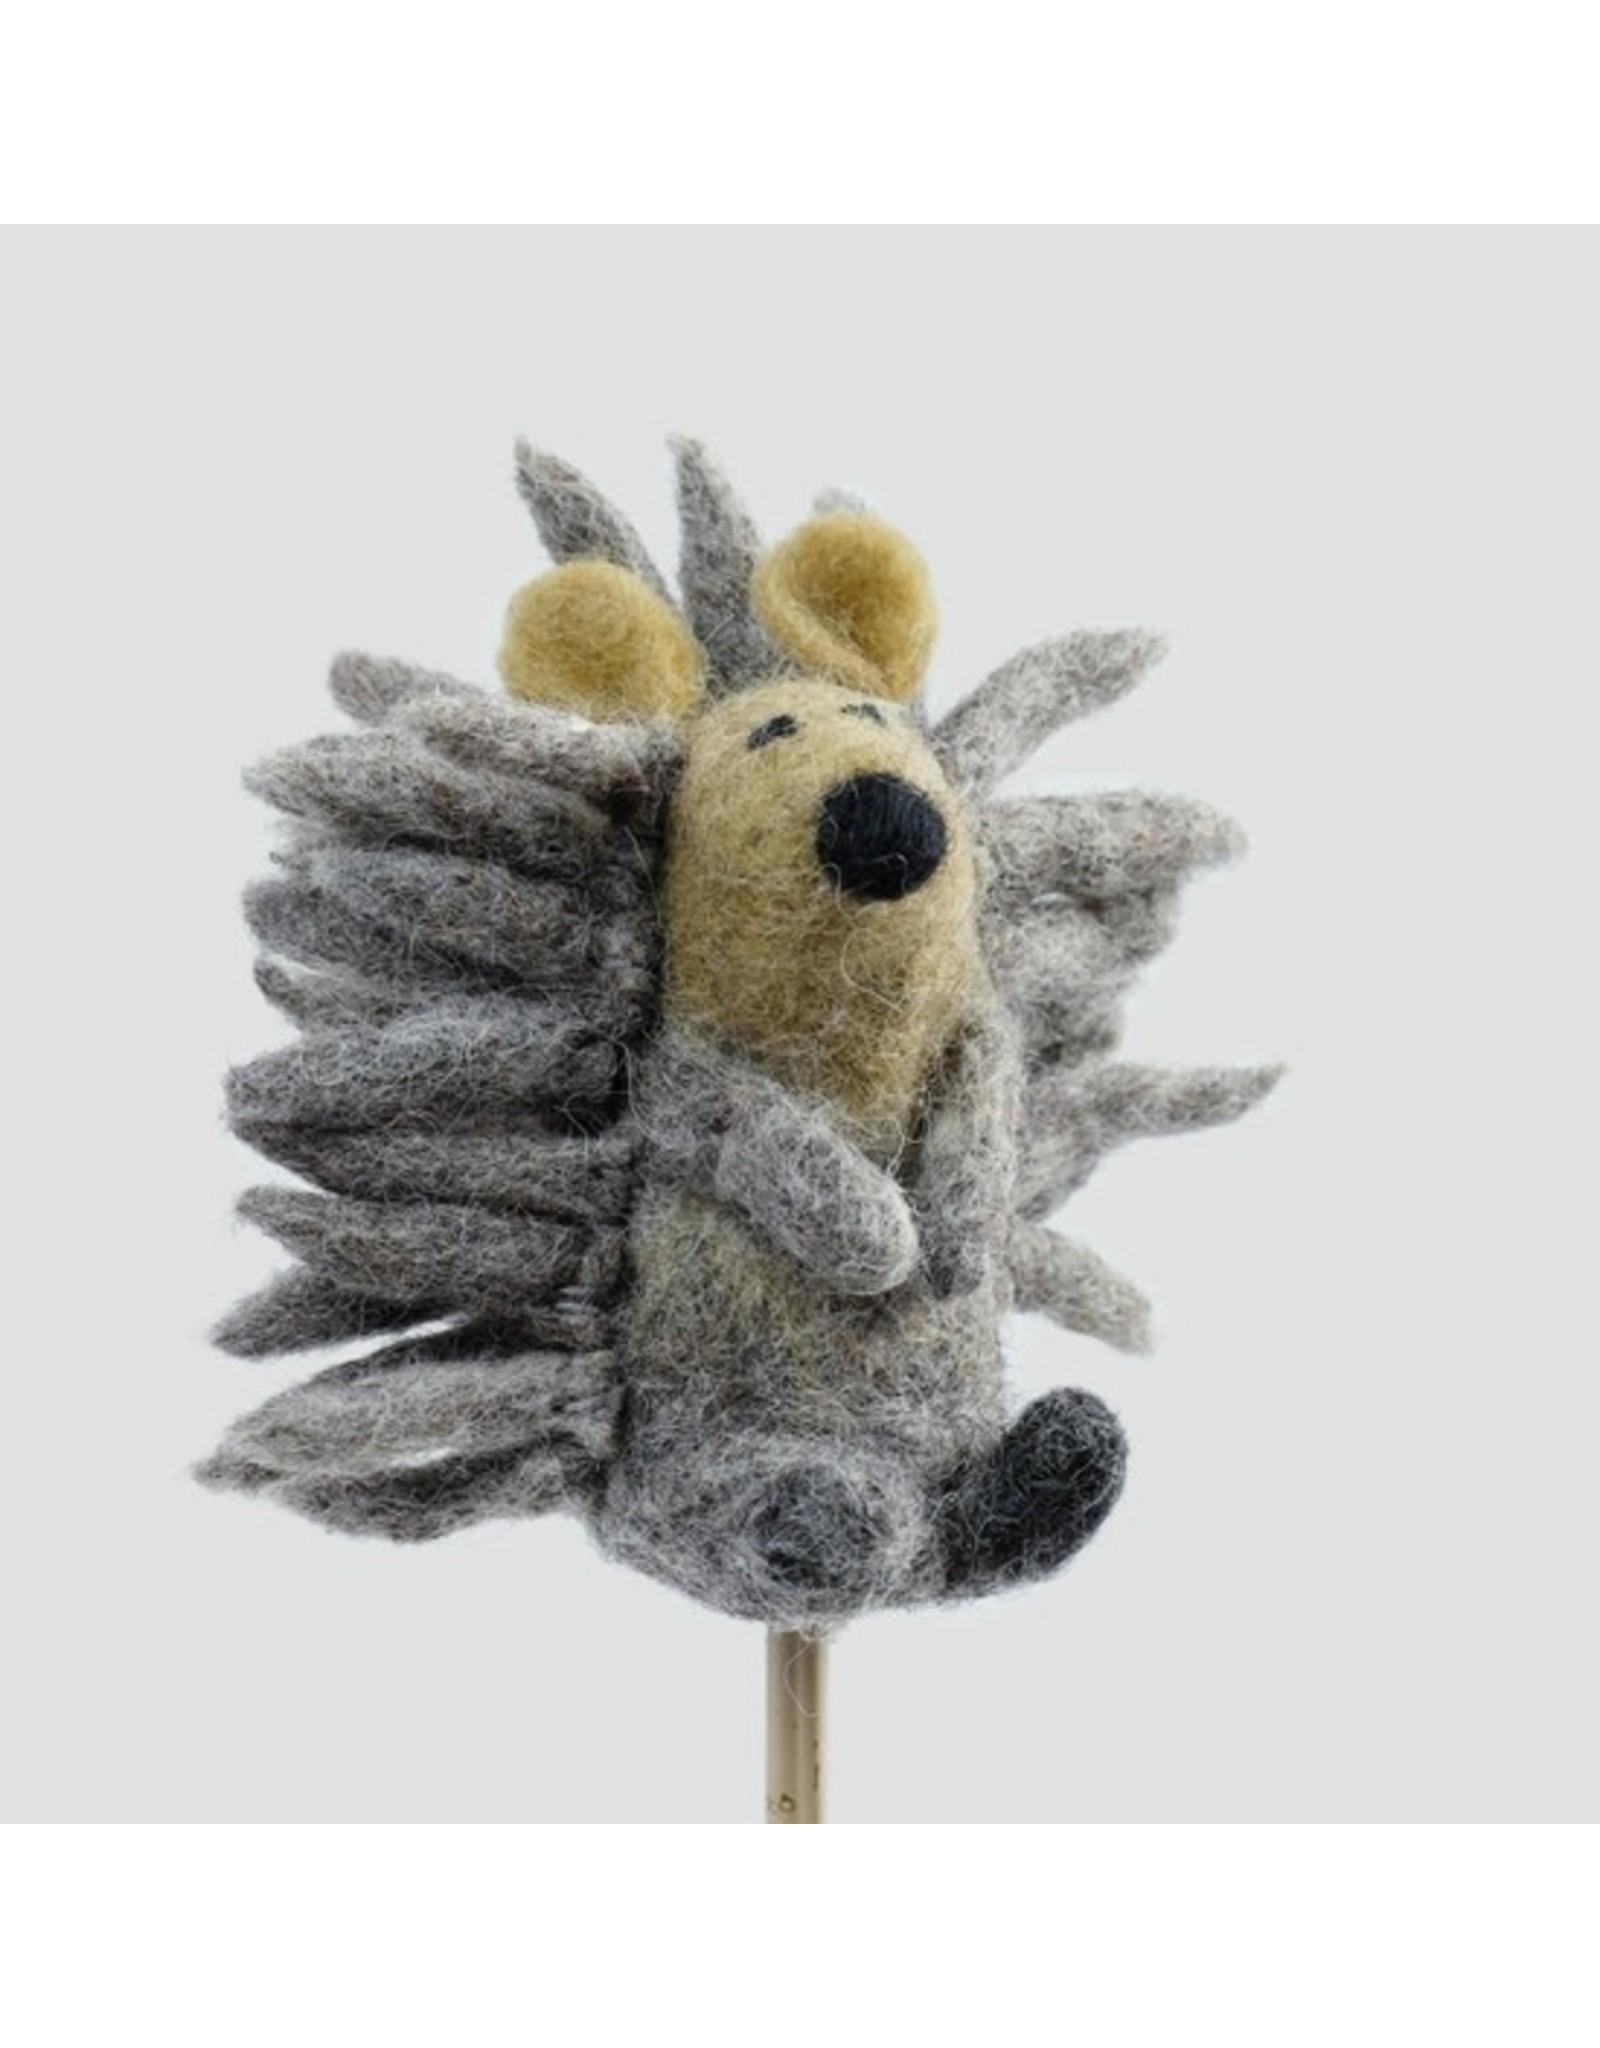 Felt Finger Puppet, Hedgehog, Nepal